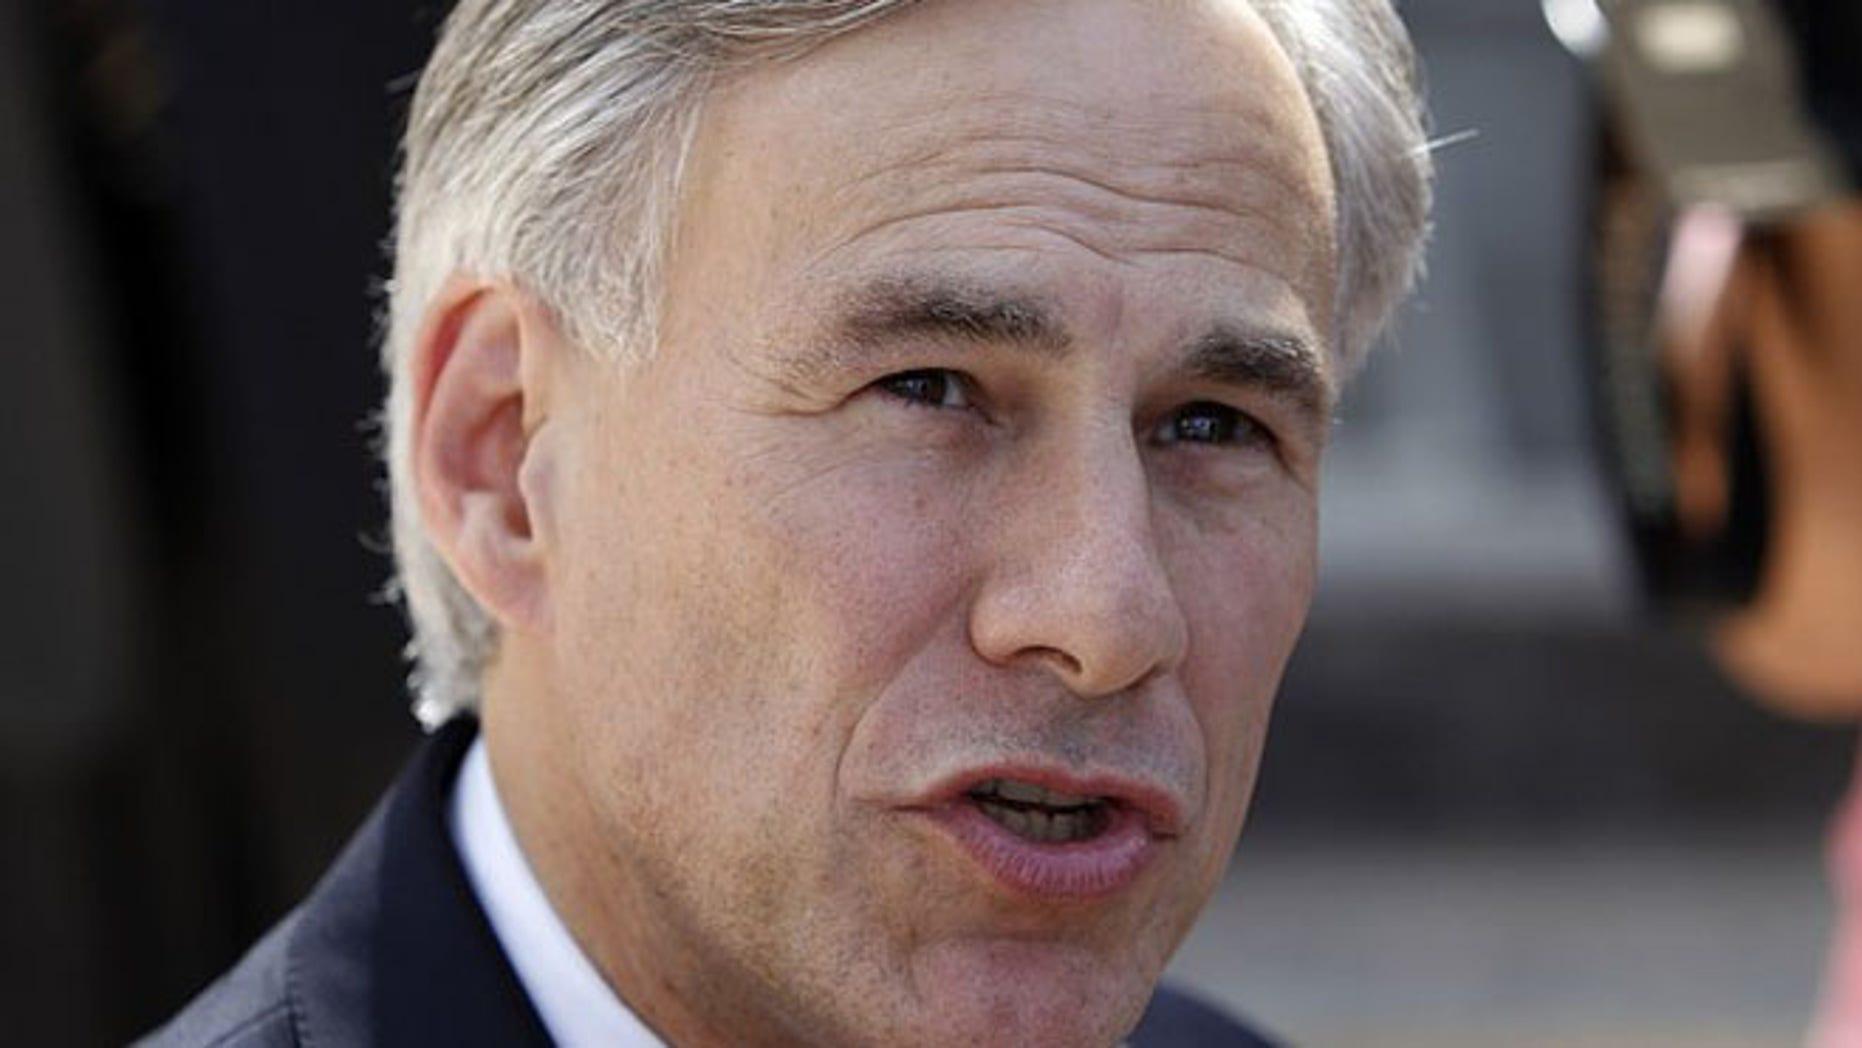 Texas Gov. Greg Abbott has signaled he will sign the gun law.